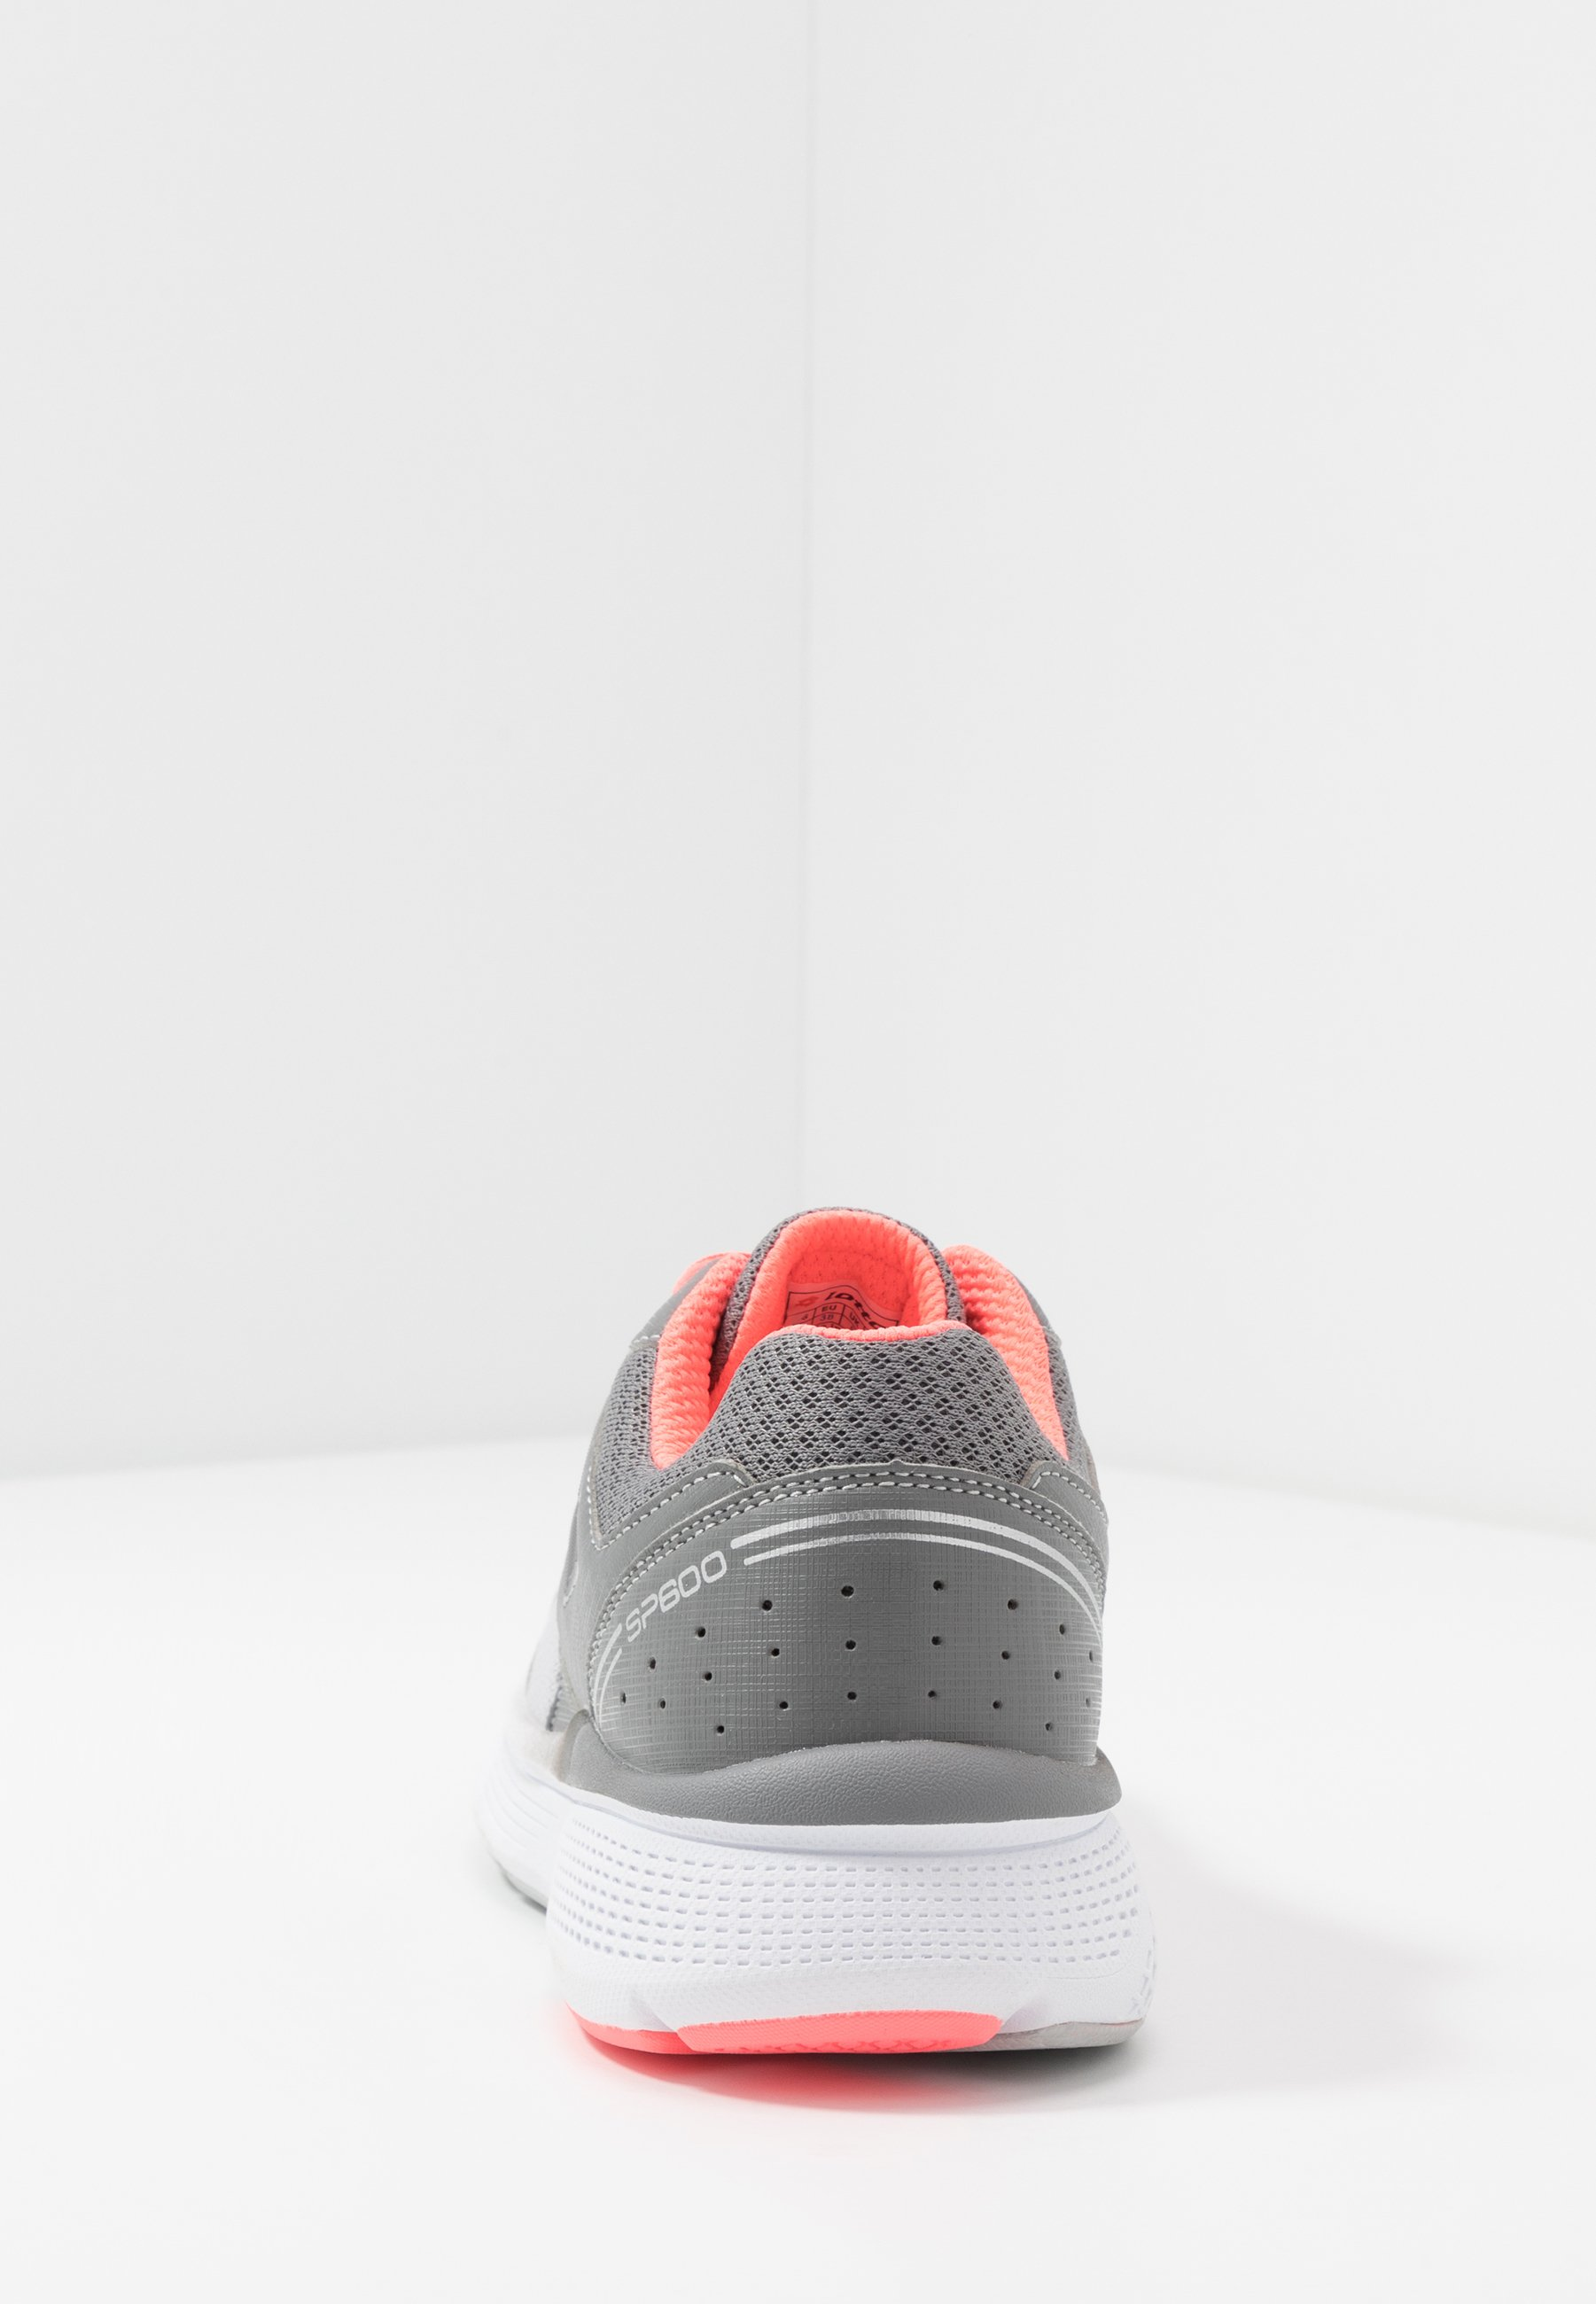 Lotto Speedride 600 Vii - Chaussures De Running Neutres Vapor Gray/cool Gray